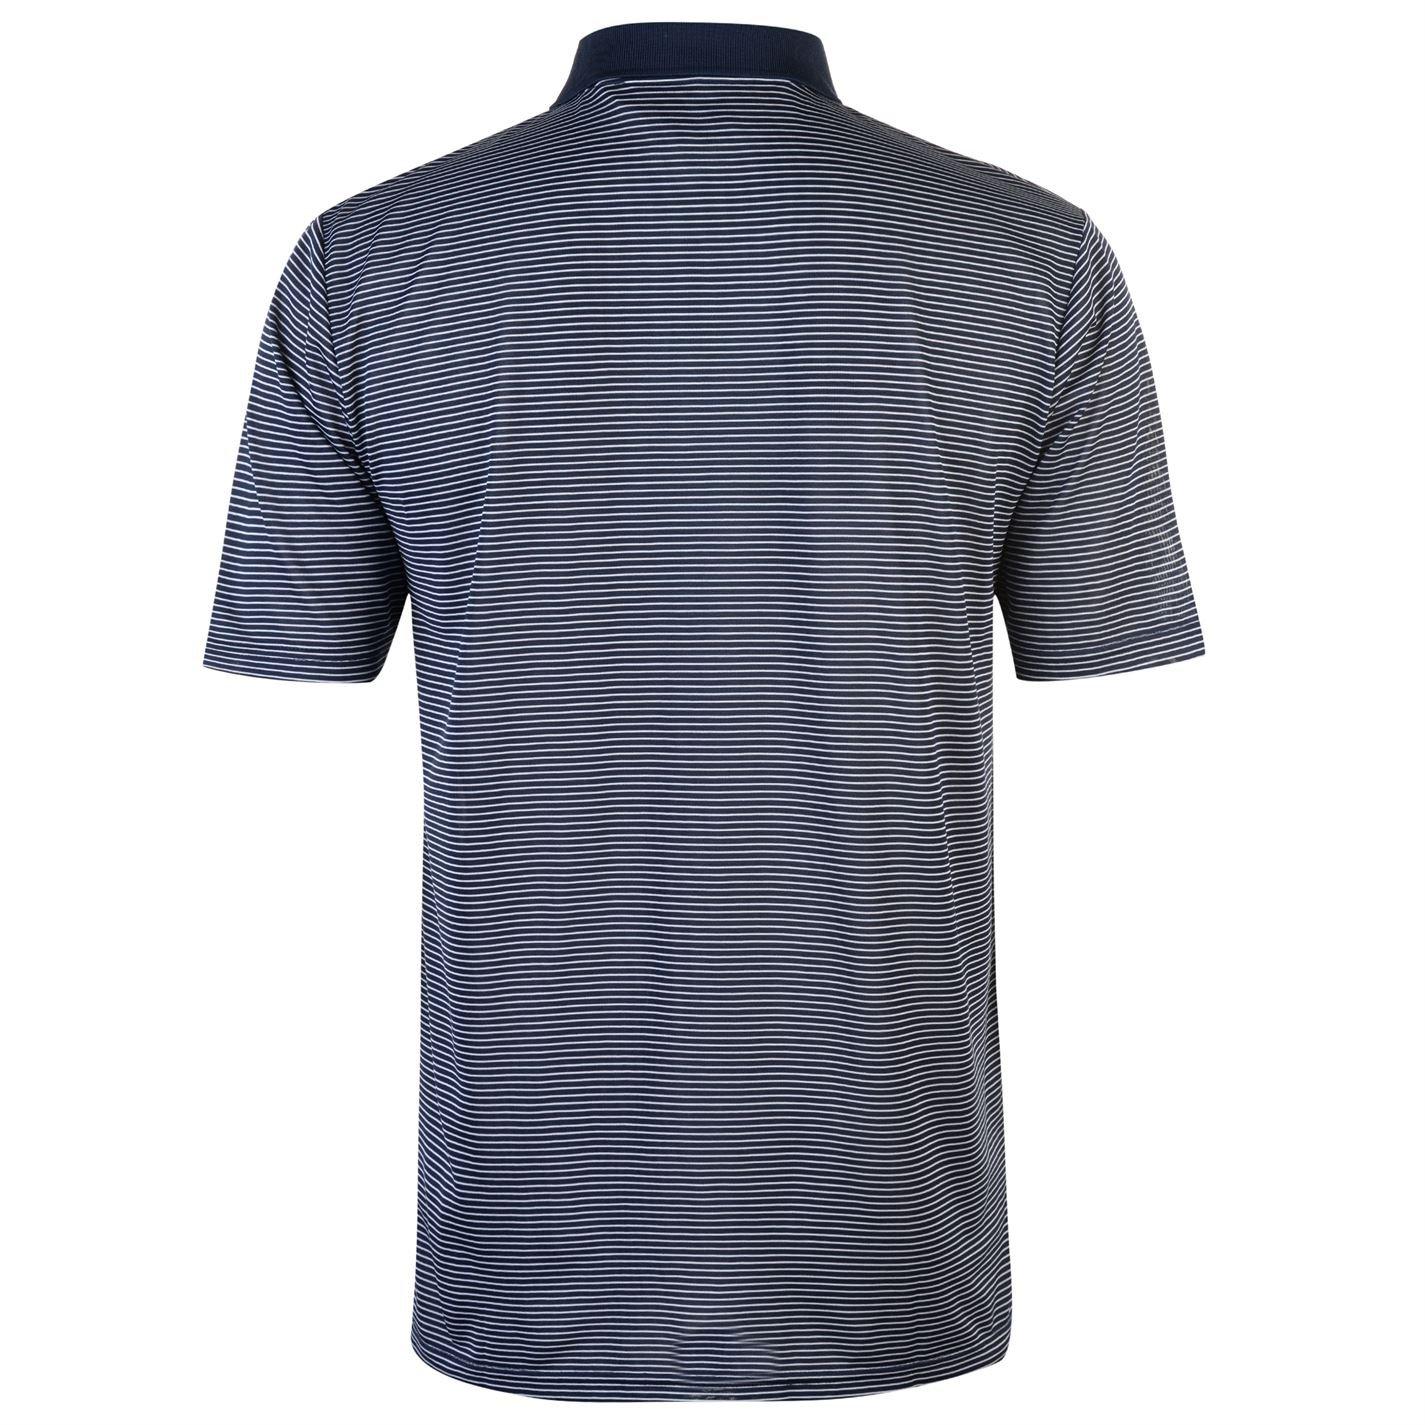 Slazenger Herren-Poloshirt, kurzarm B07J5QN82G B07J5QN82G B07J5QN82G Poloshirts Viel Spaß 394e03